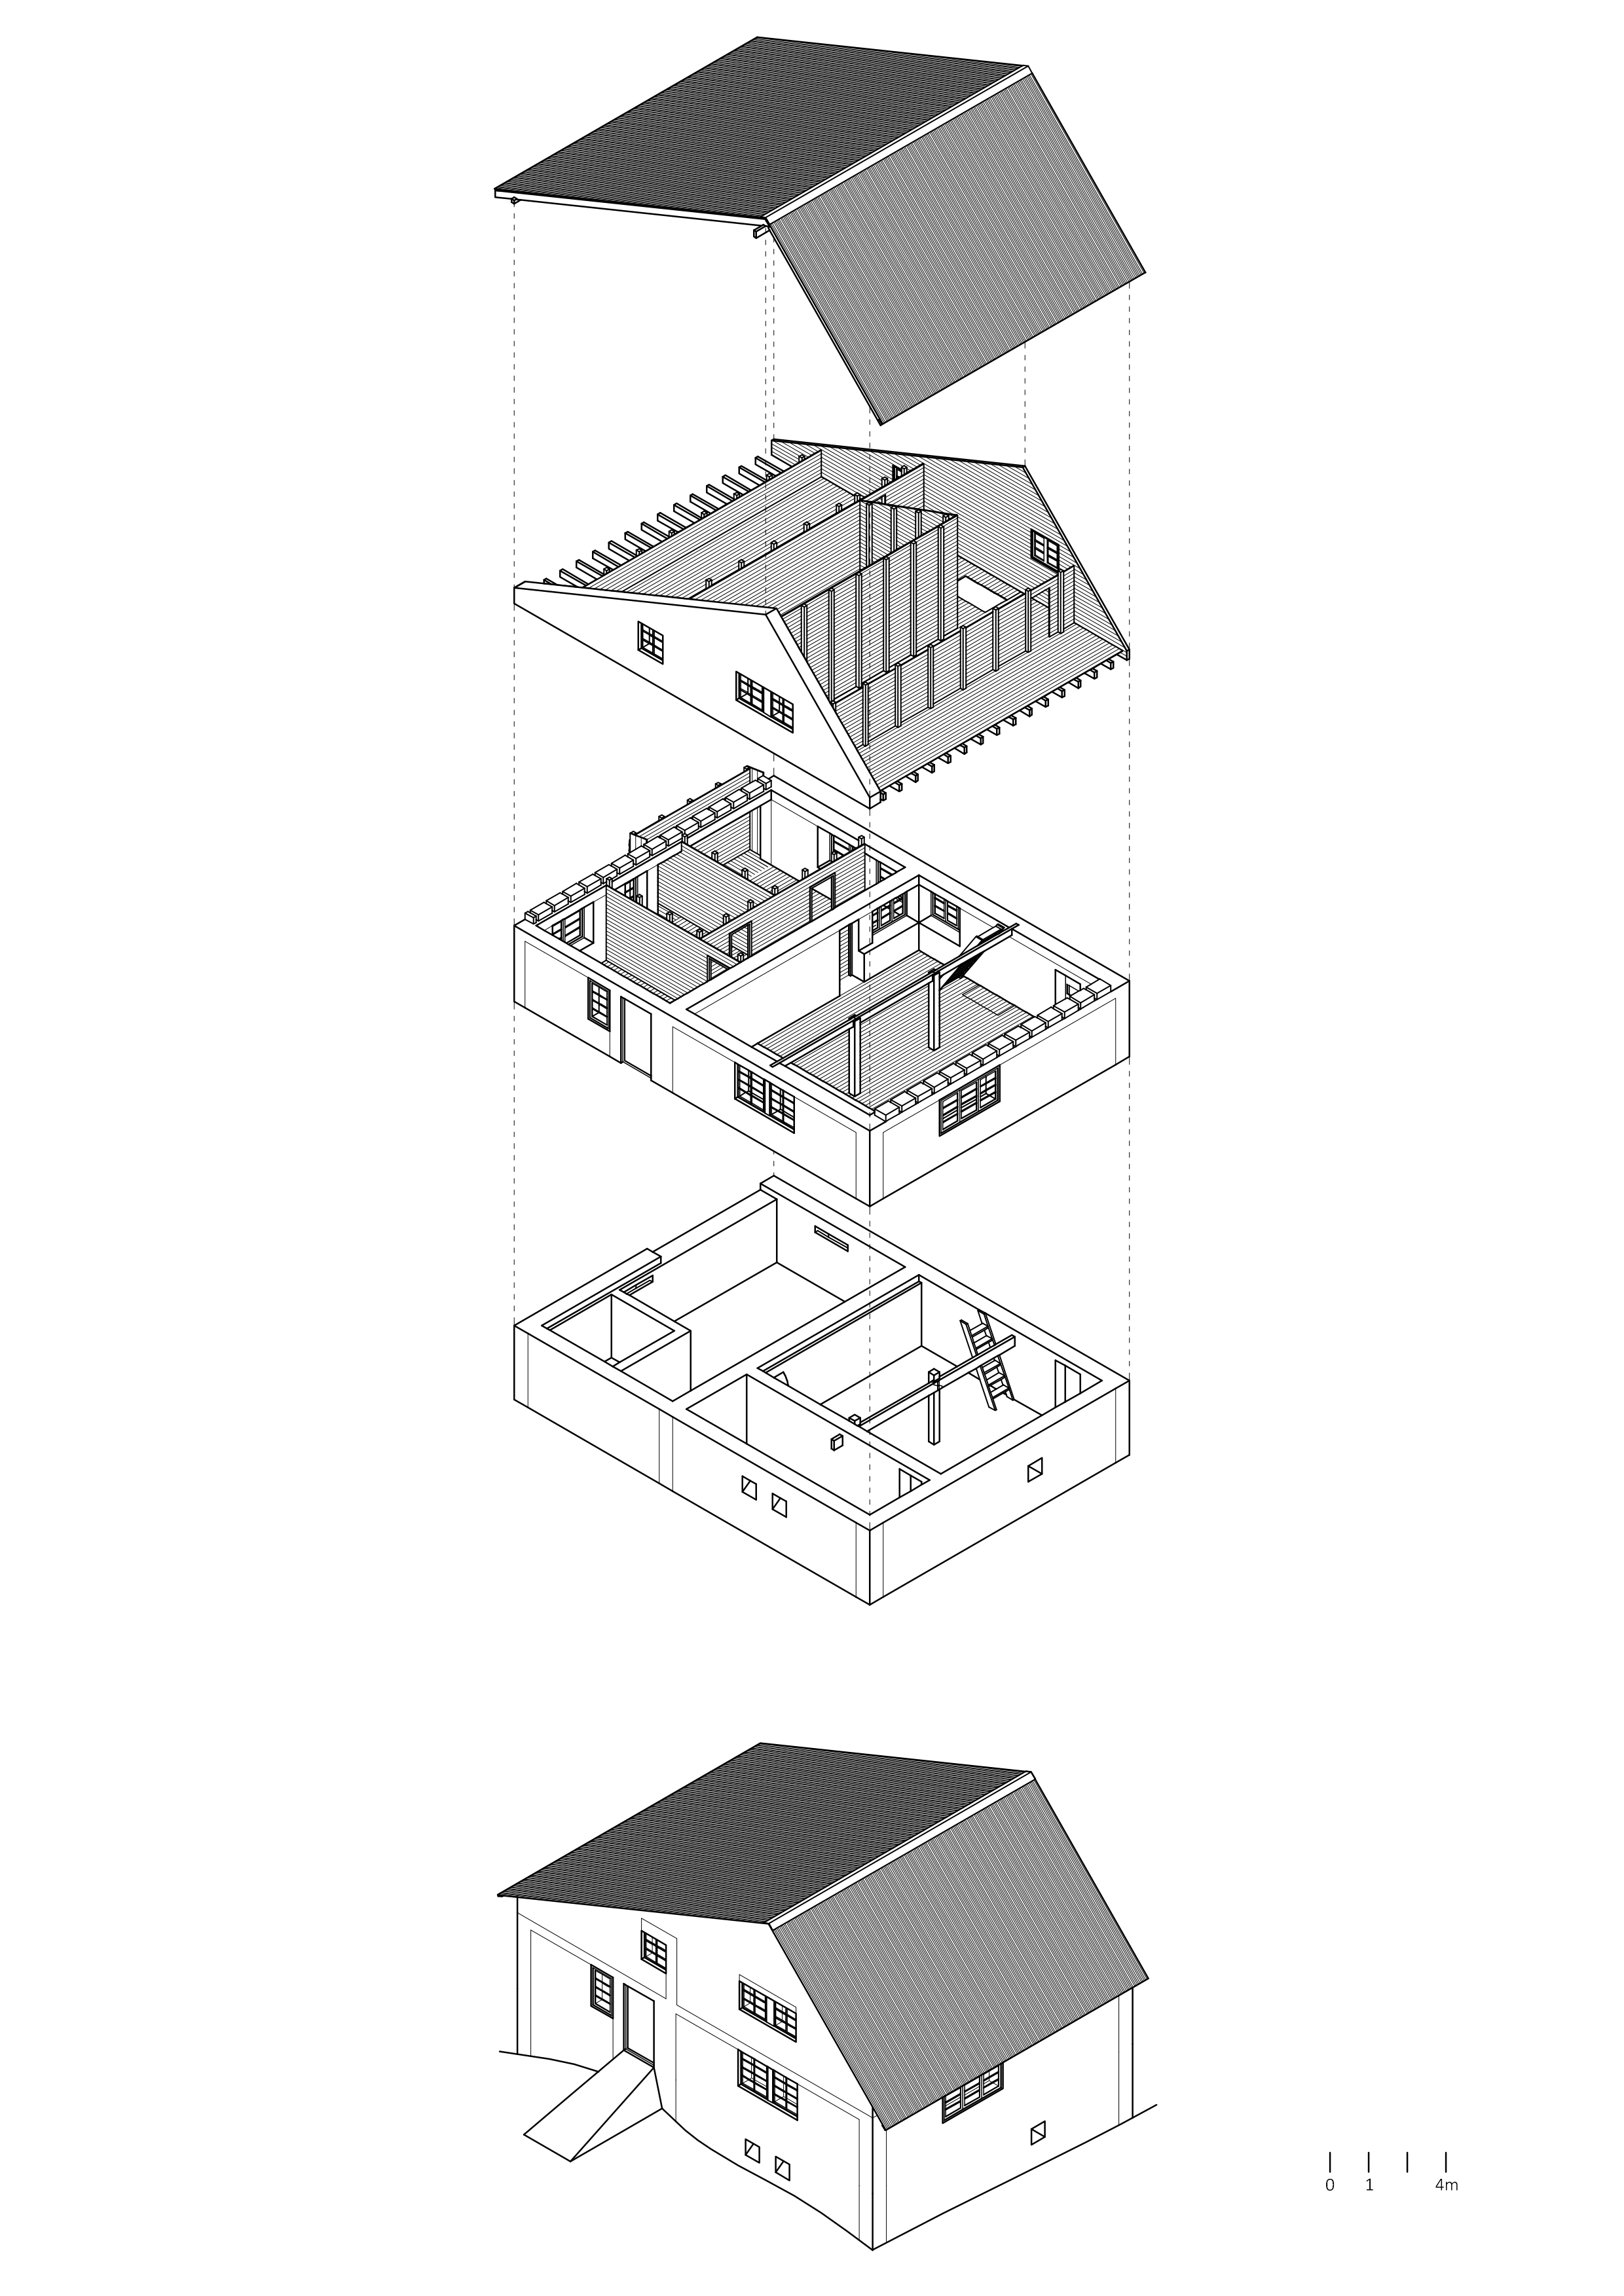 6. Isométrica explotada del Refugio Garganta del Diablo - Katrin Benöhr